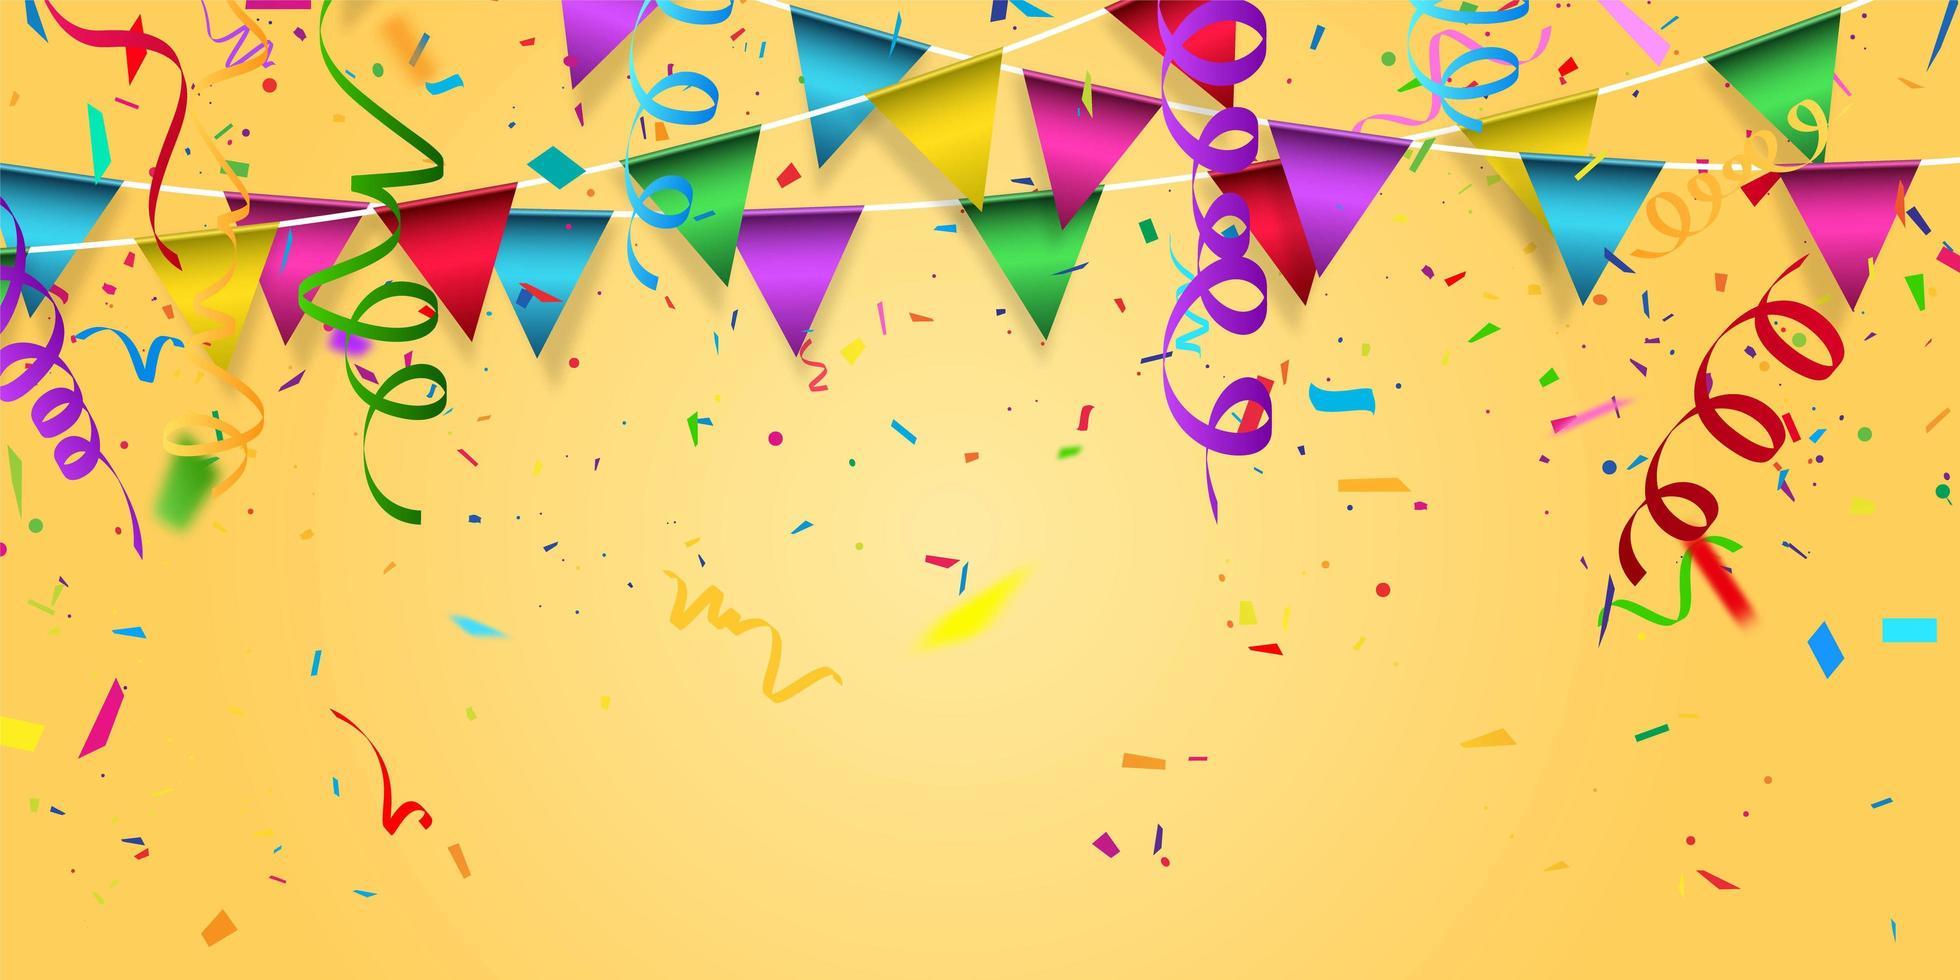 Party Flag und Konfetti Konzept Design Vorlage vektor